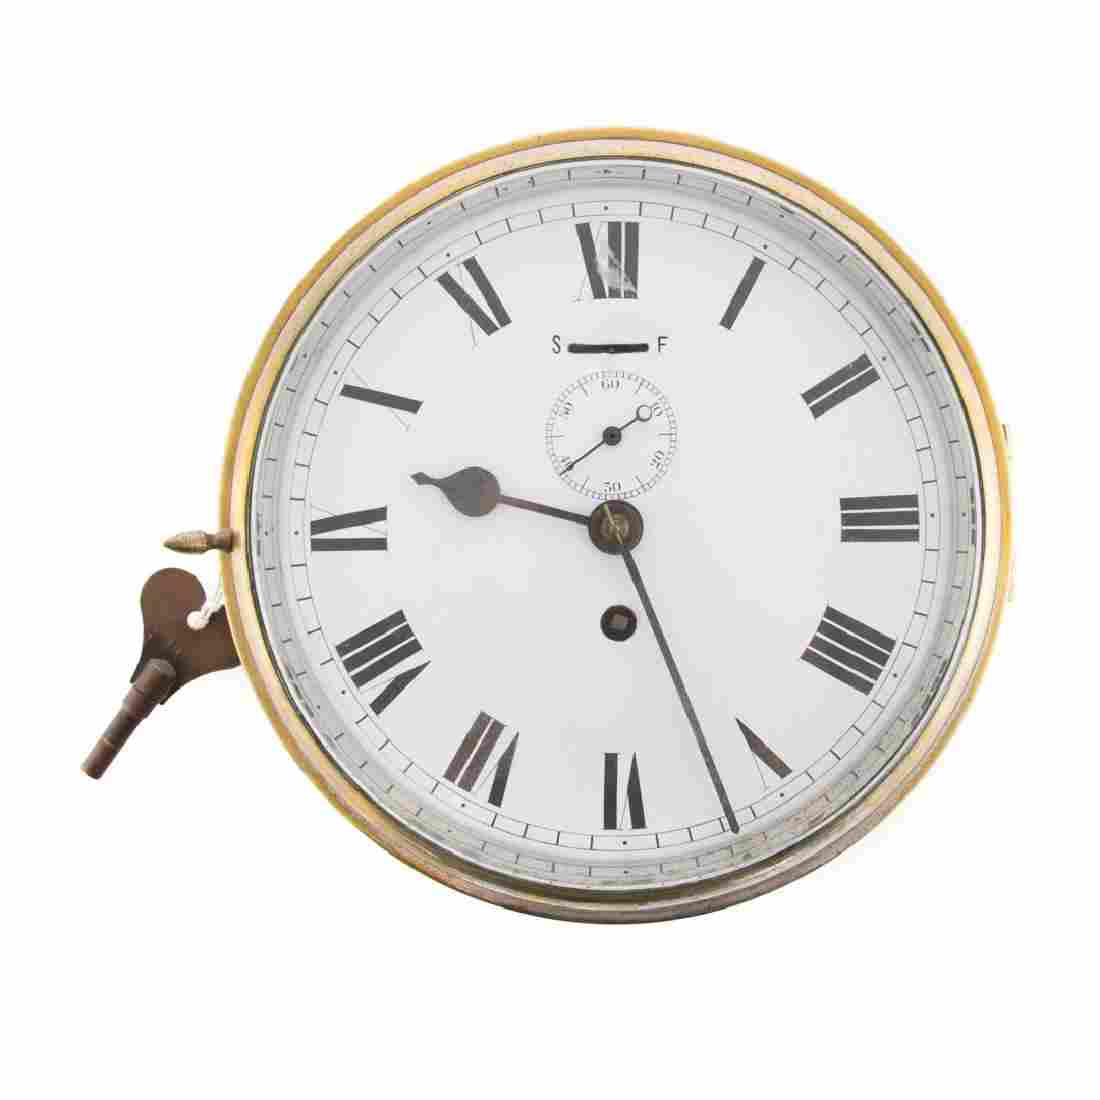 Brass porthole ship's clock